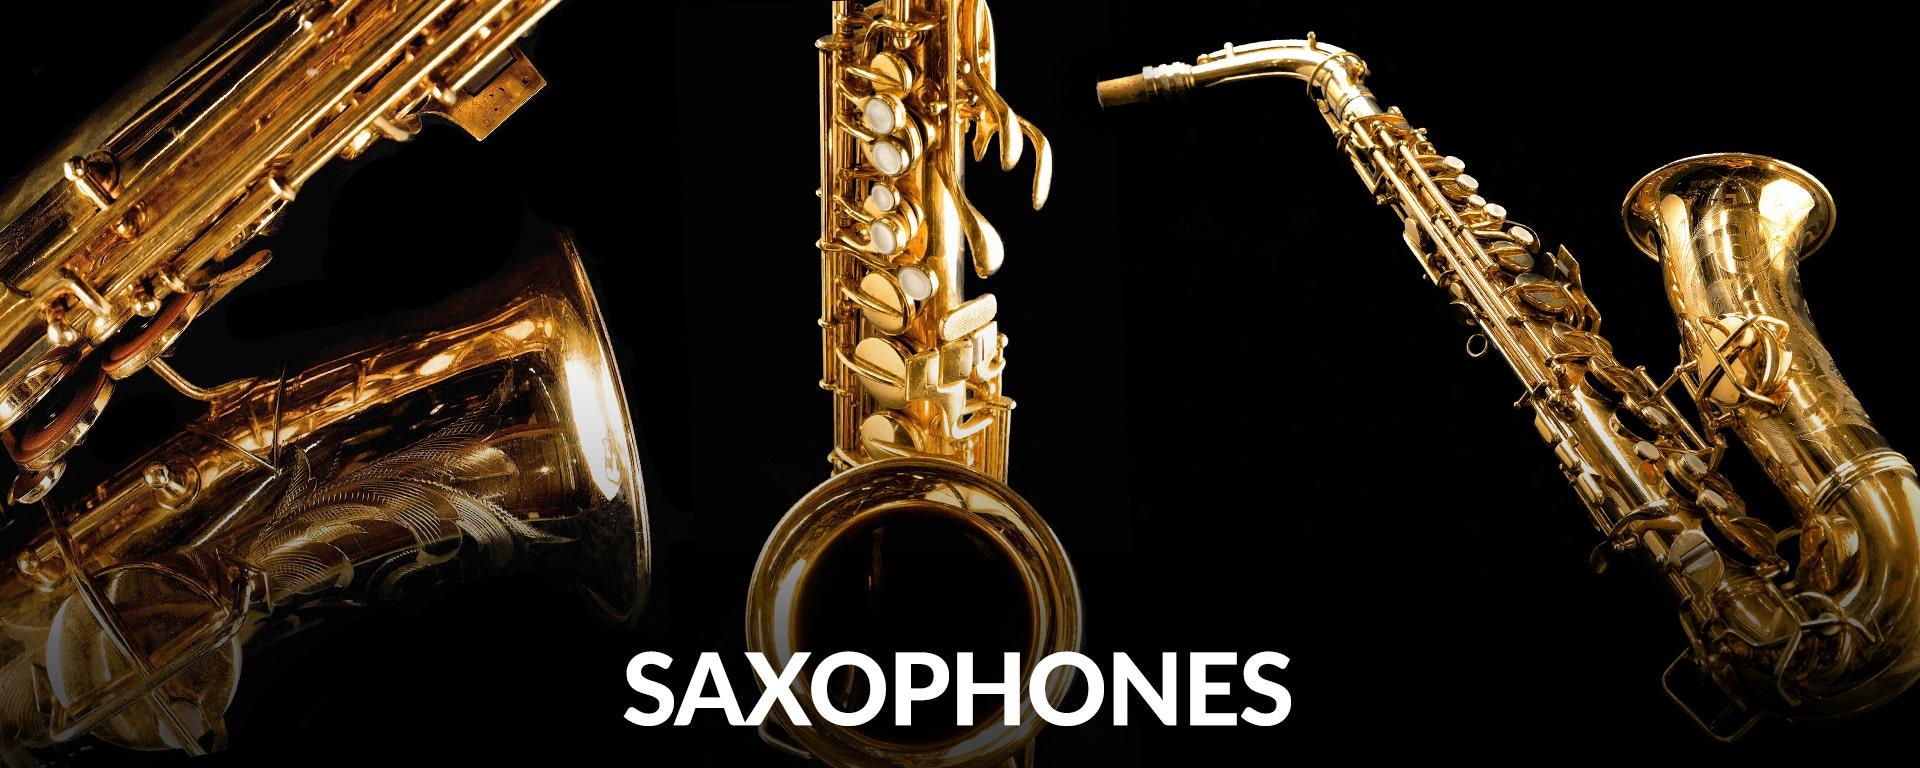 Shop Saxophones at SamAsh.com